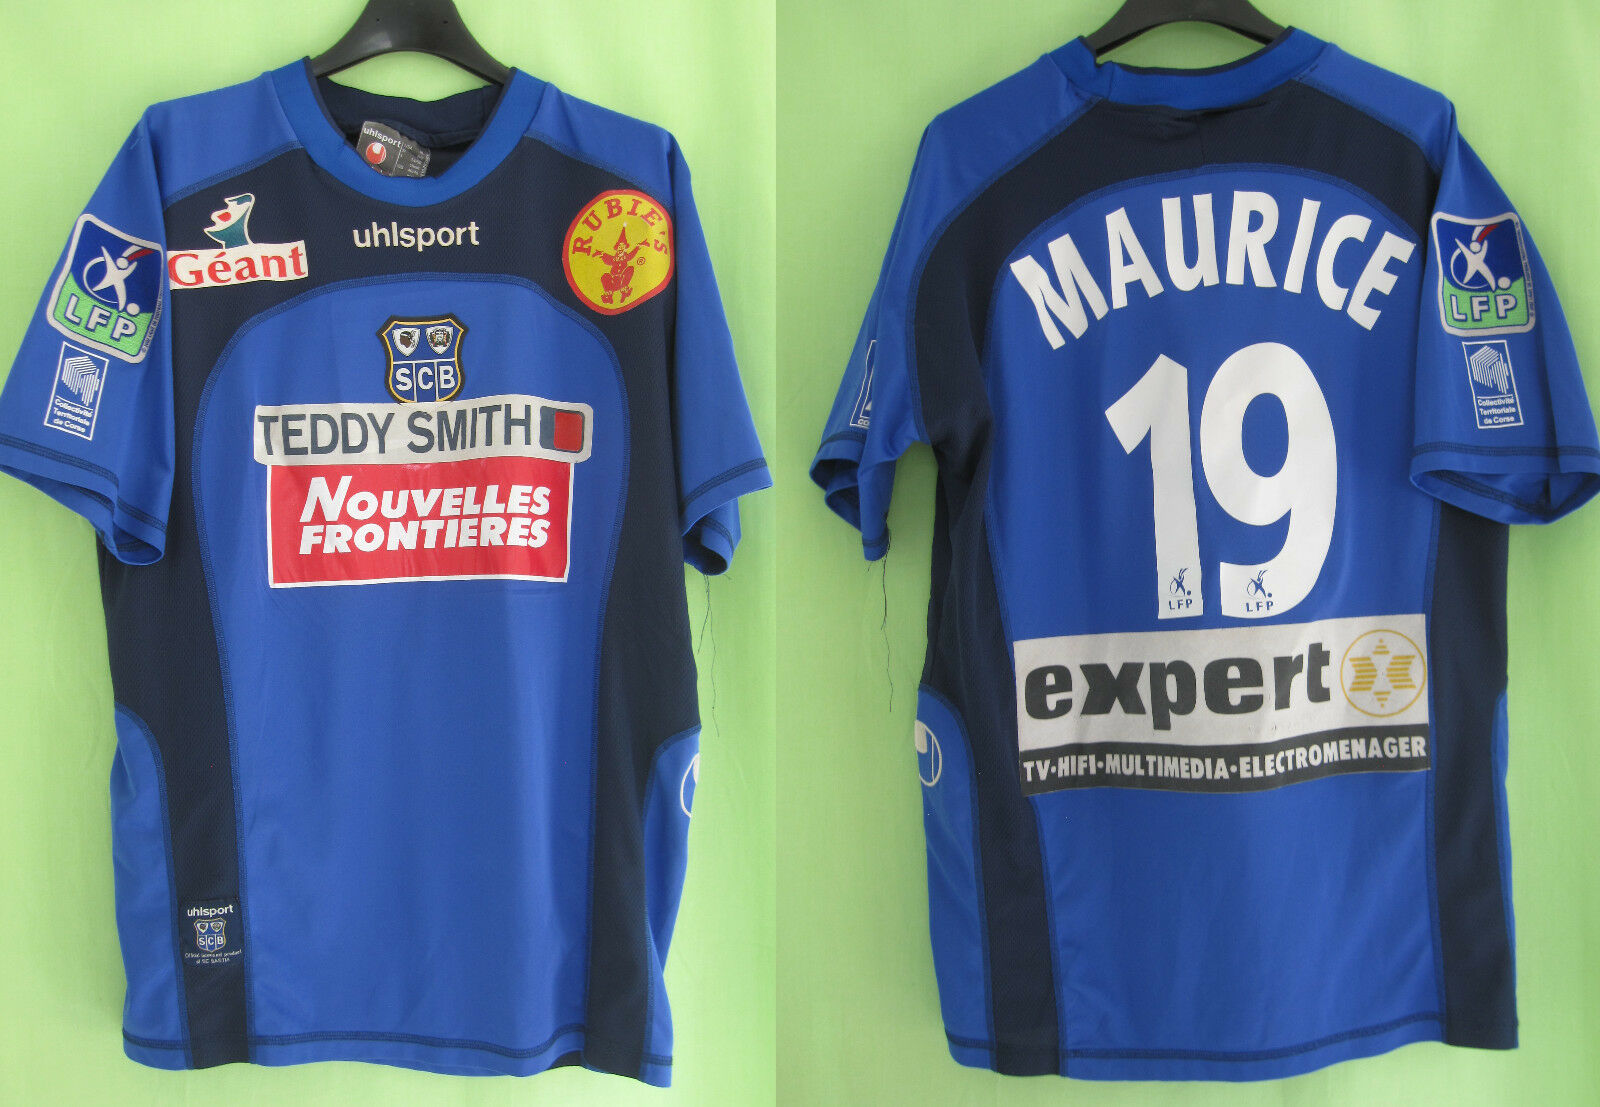 Maillot Sc Bastia  19 Porté Maurice SCB Uhlsport Teddy Smith vintage  XL